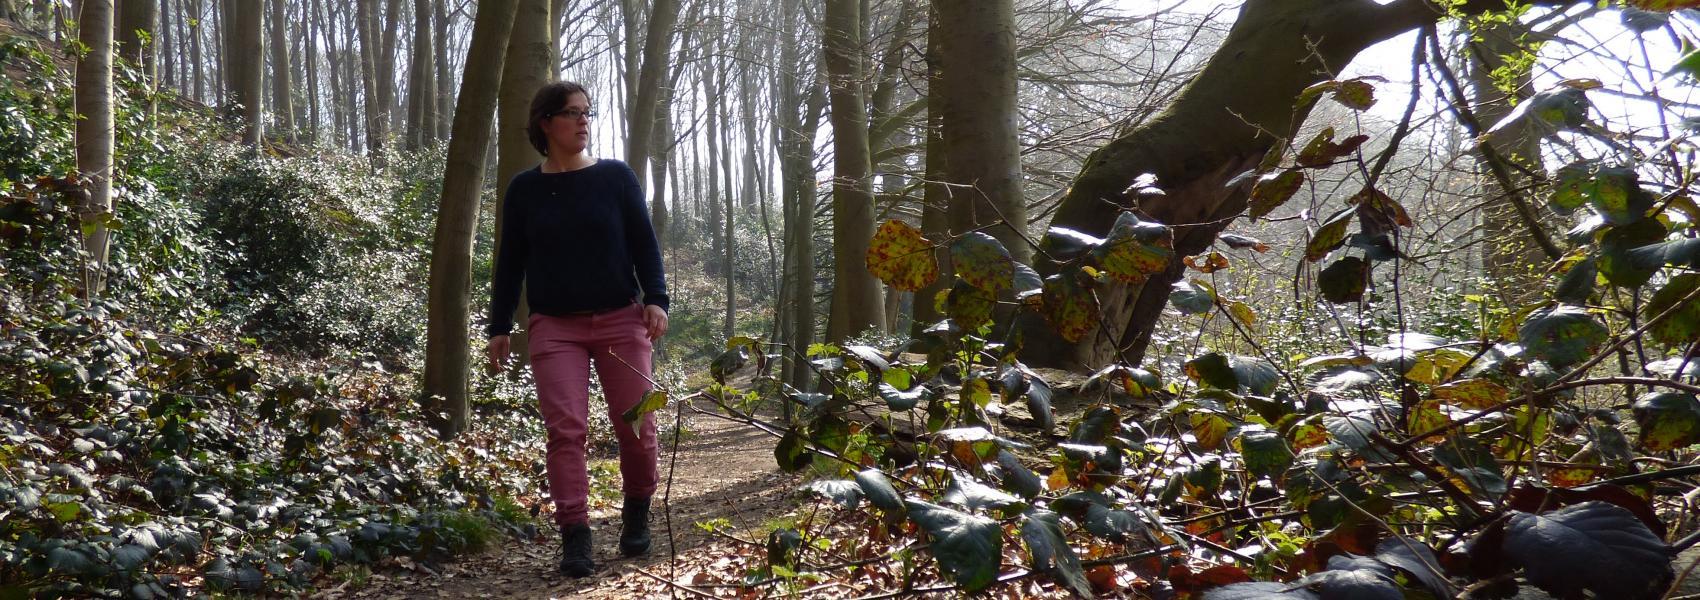 wandelaar in het bos